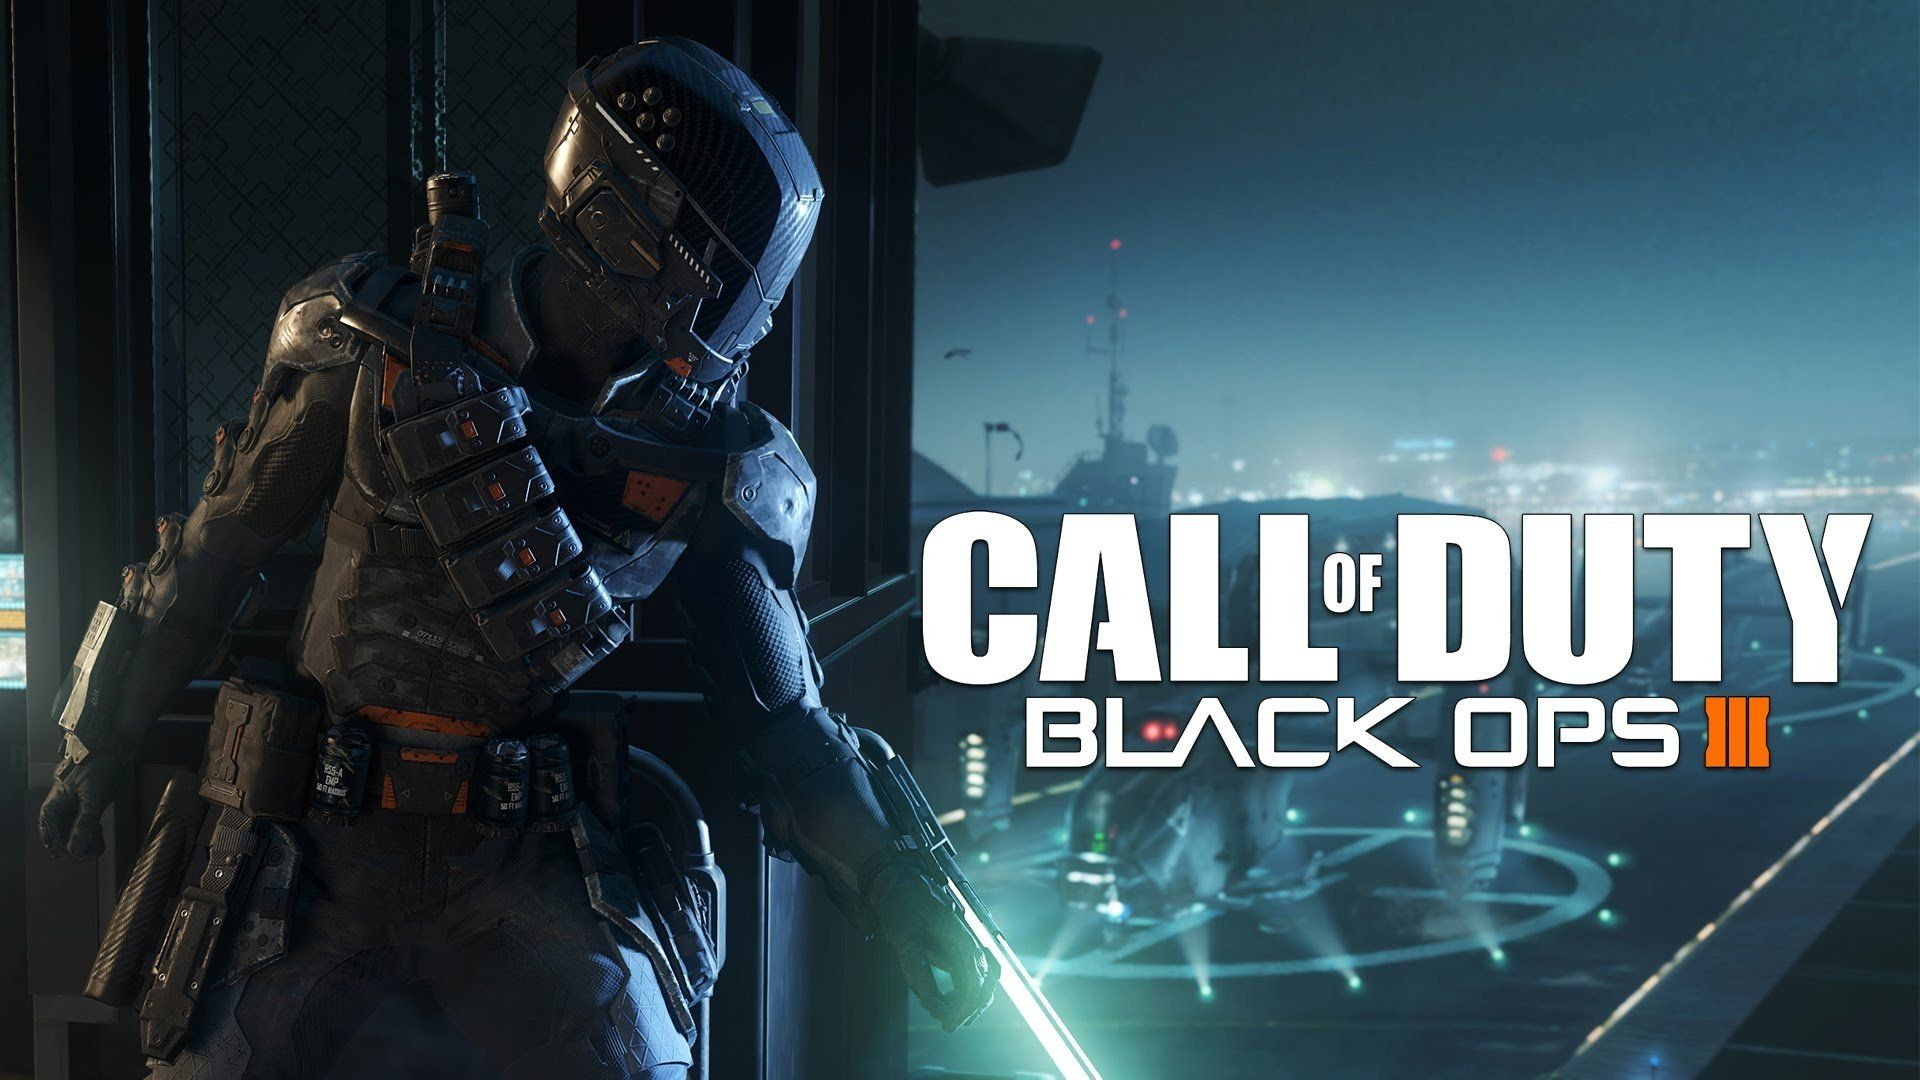 Call Of Duty Black Ops 3 Wallpapers Desktop Background Desktop Wallpaper Box Call Of Duty Call Of Duty Black Black Ops